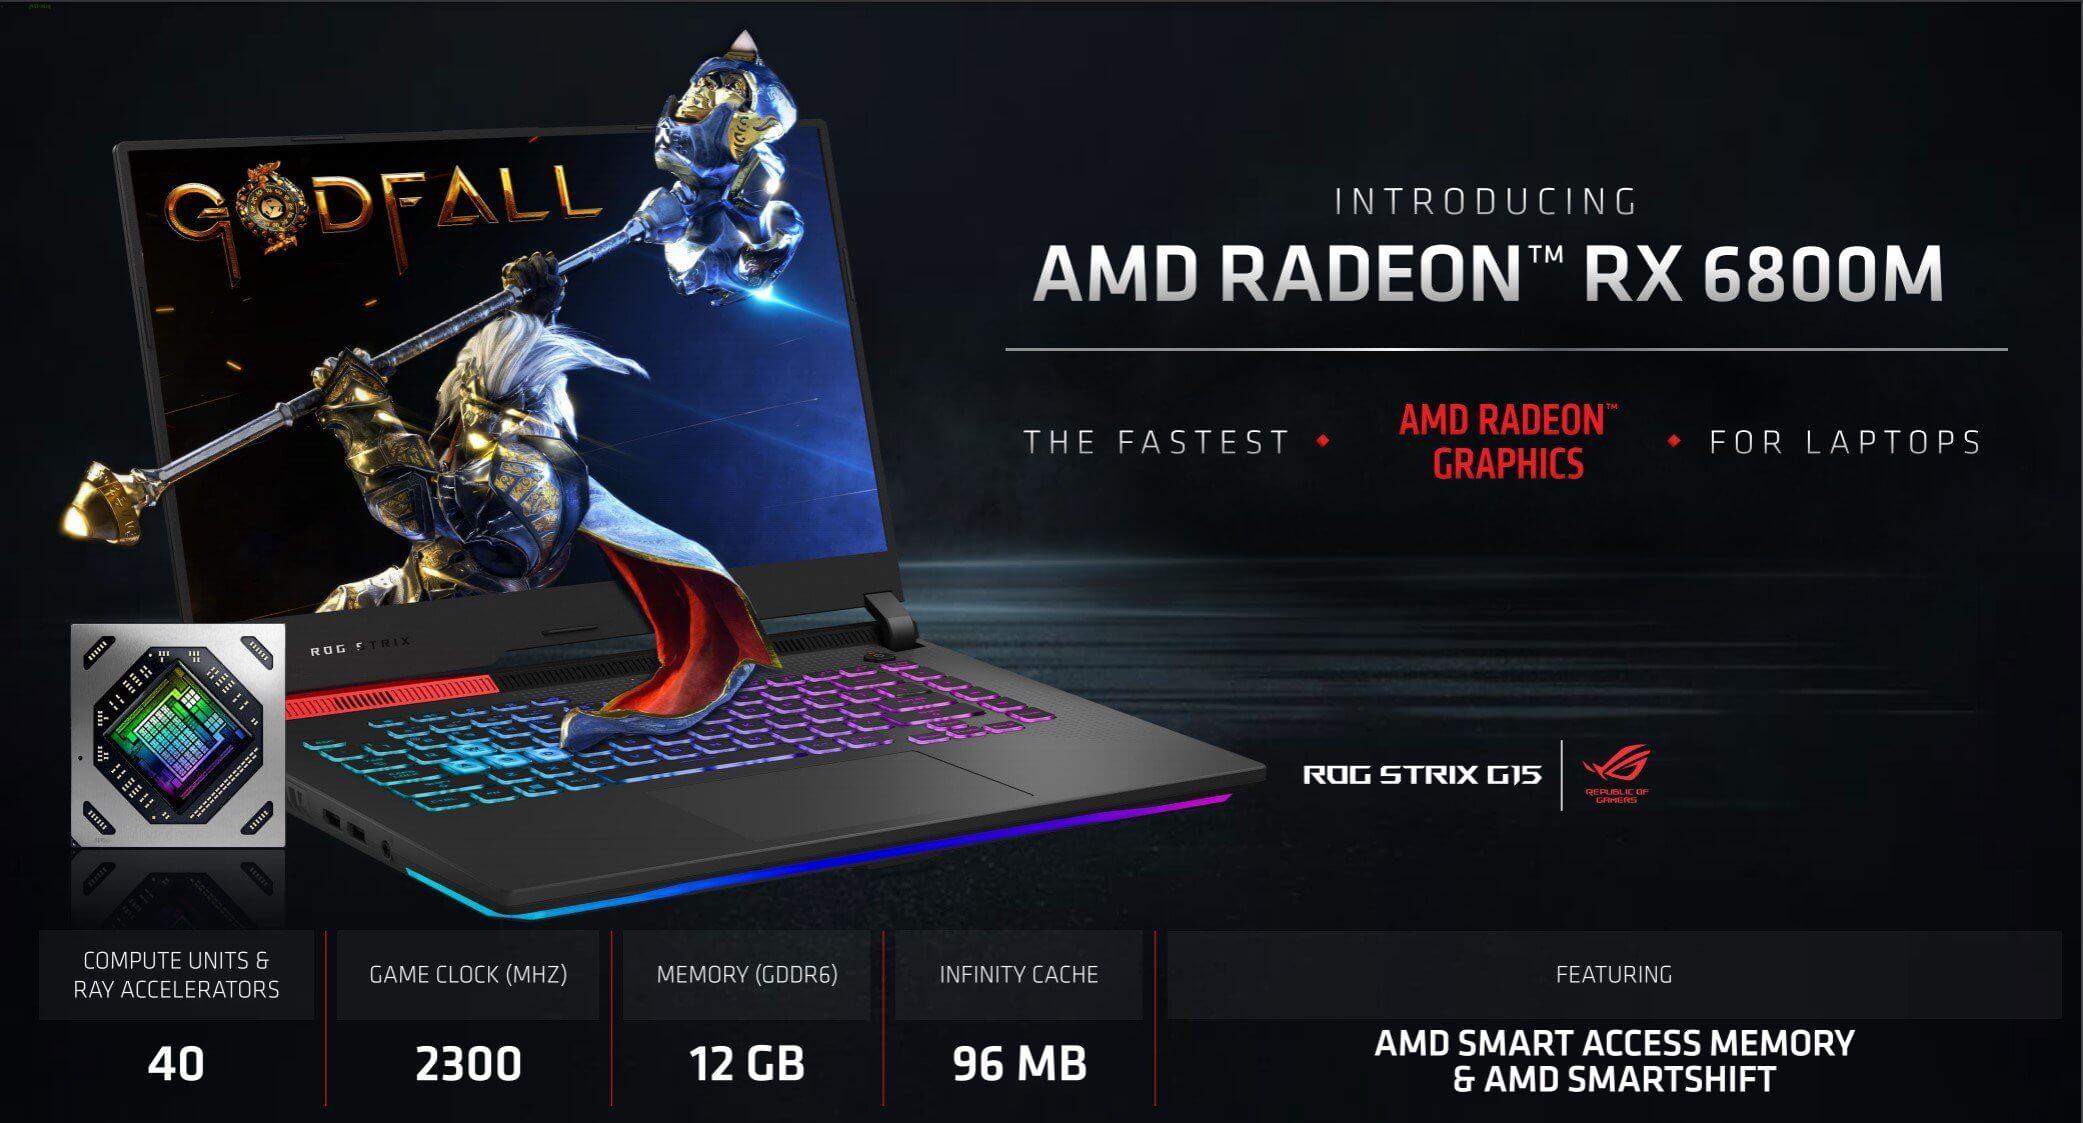 amd radeon rx 6000m laptop display kardollaryel introduced a7dLBkYQ